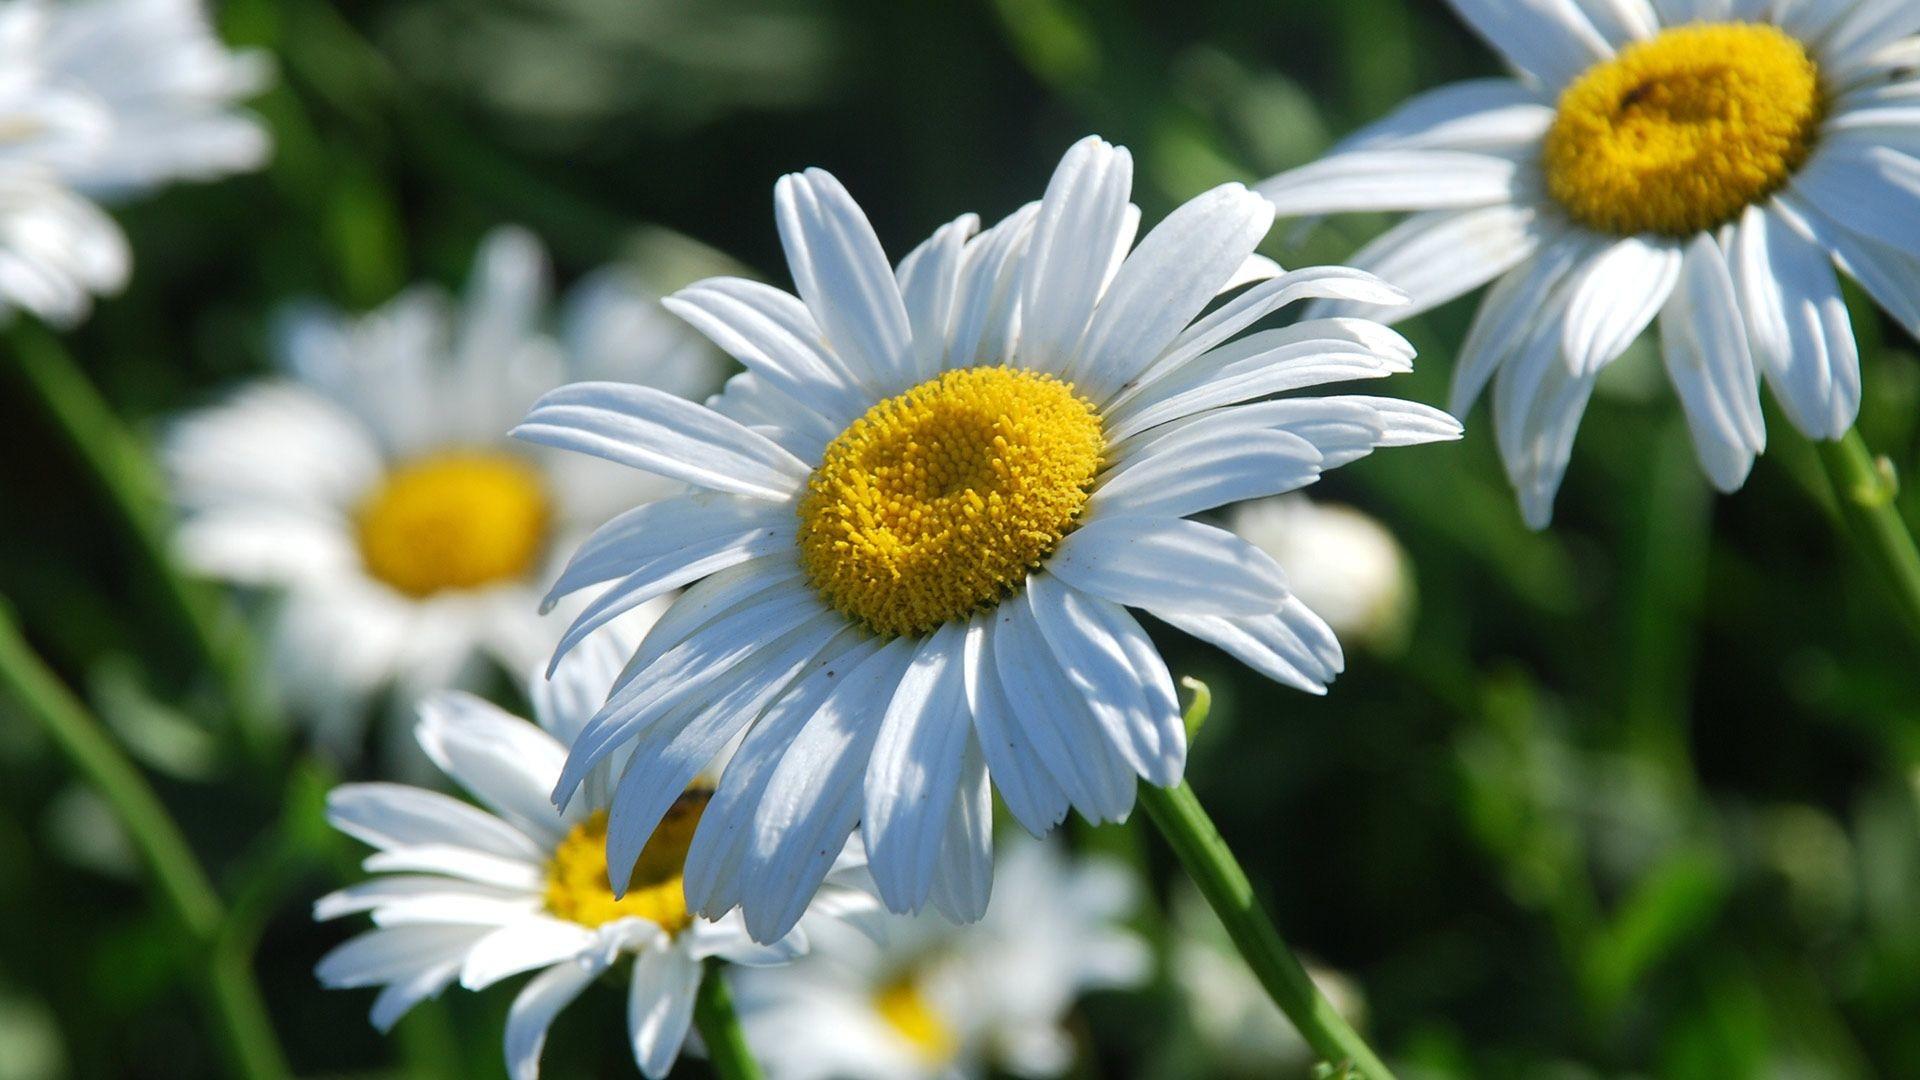 daisy flower wallpaper (57+ images)